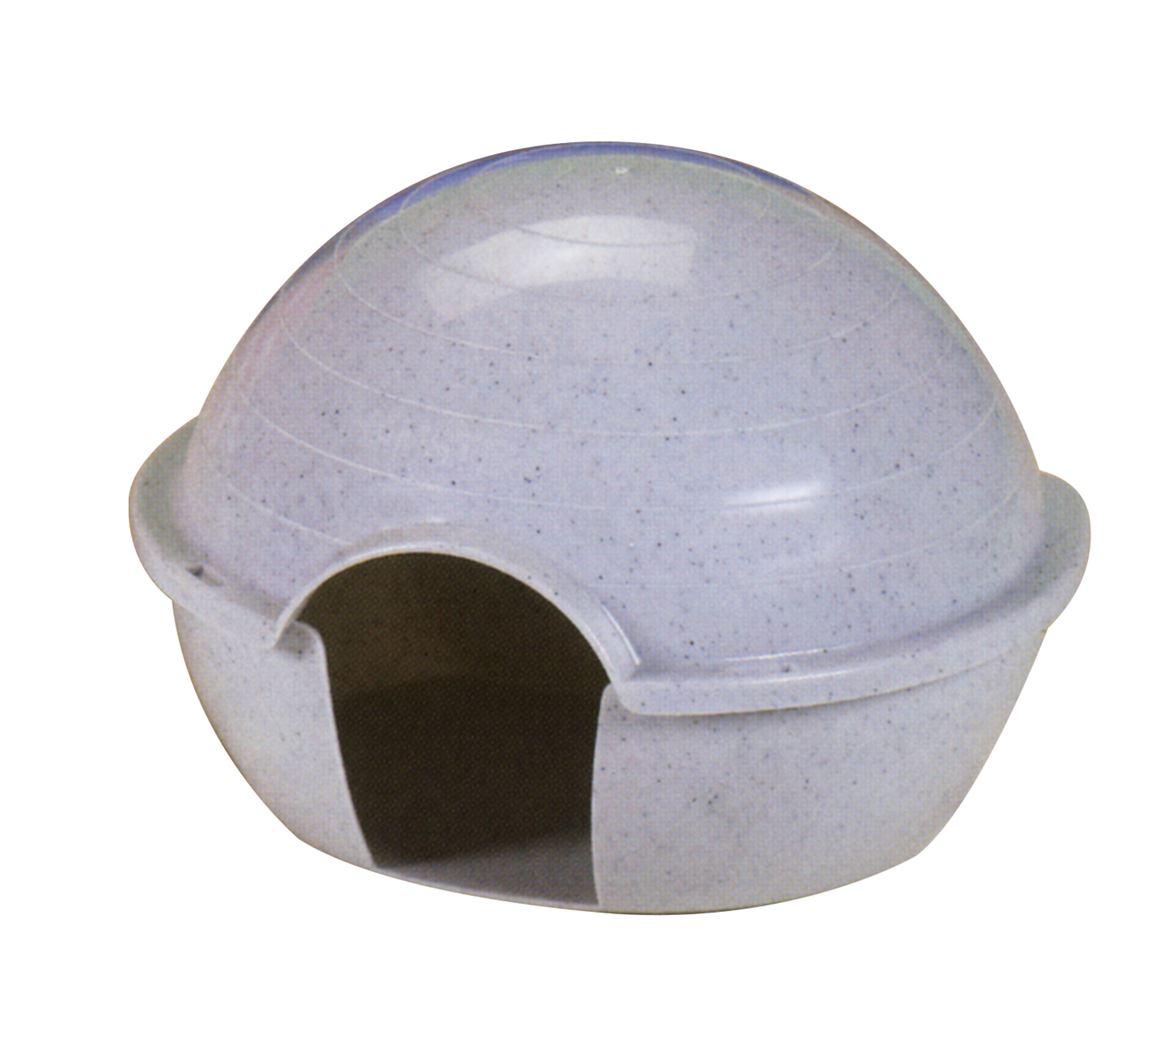 hamsterhuis-plastiek-model-iglo